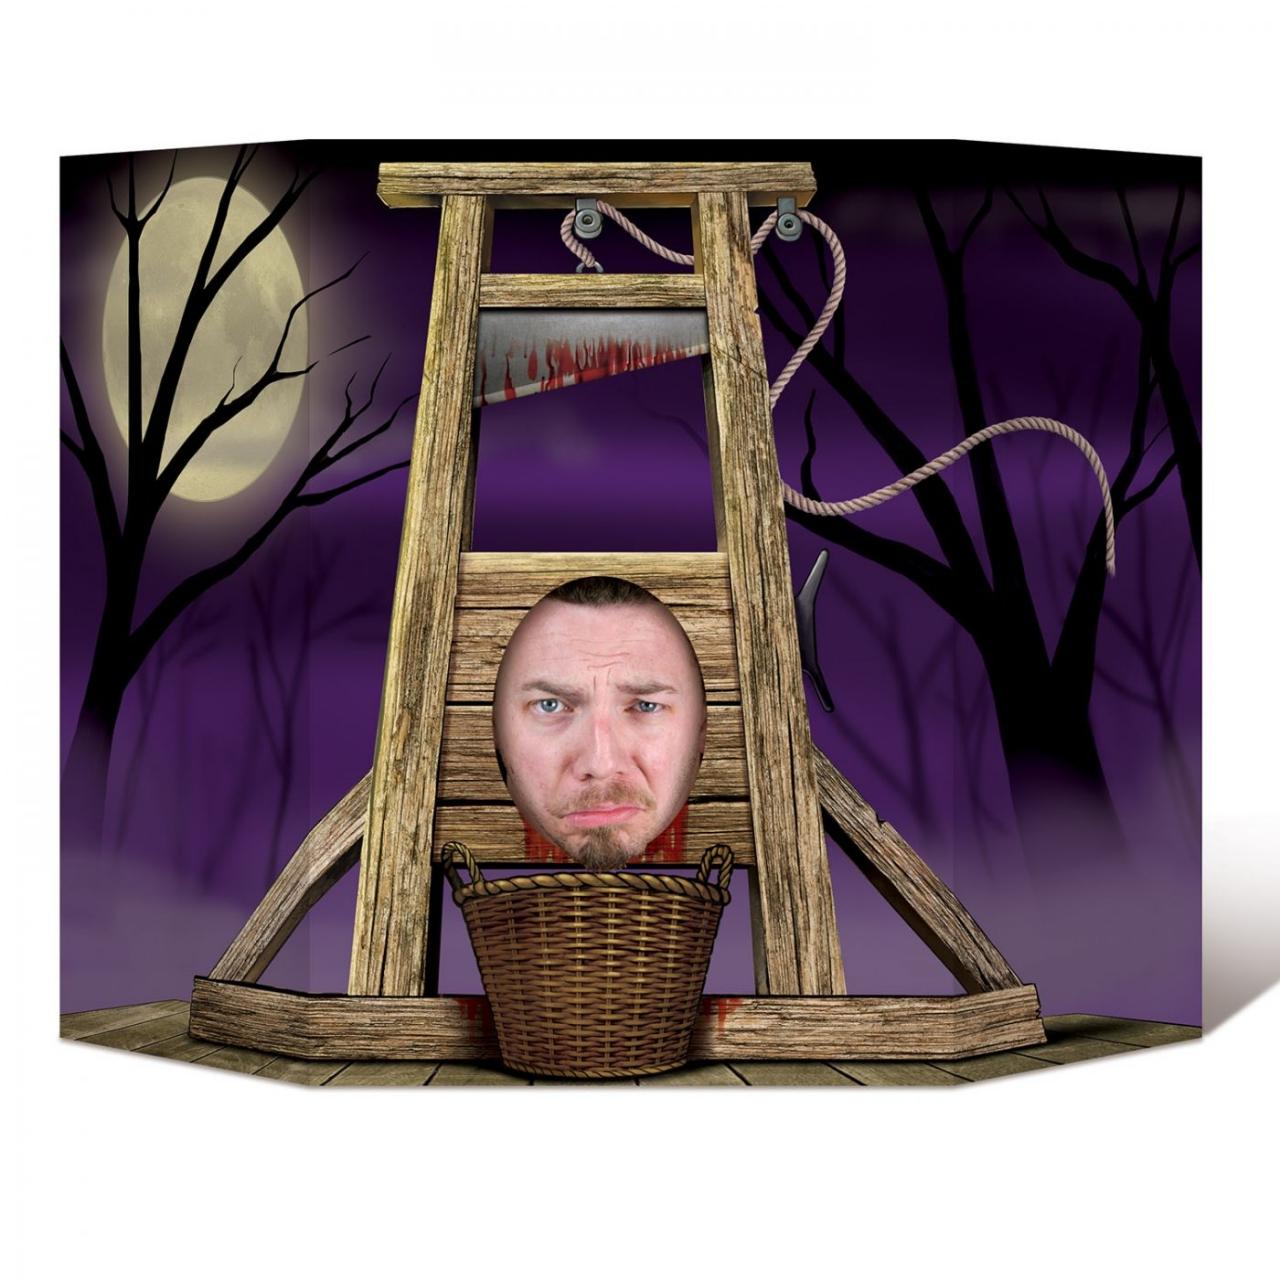 Halloween Fotowand.Fotowand Aufsteller Strafe Muss Sein 94 X 64 Cm